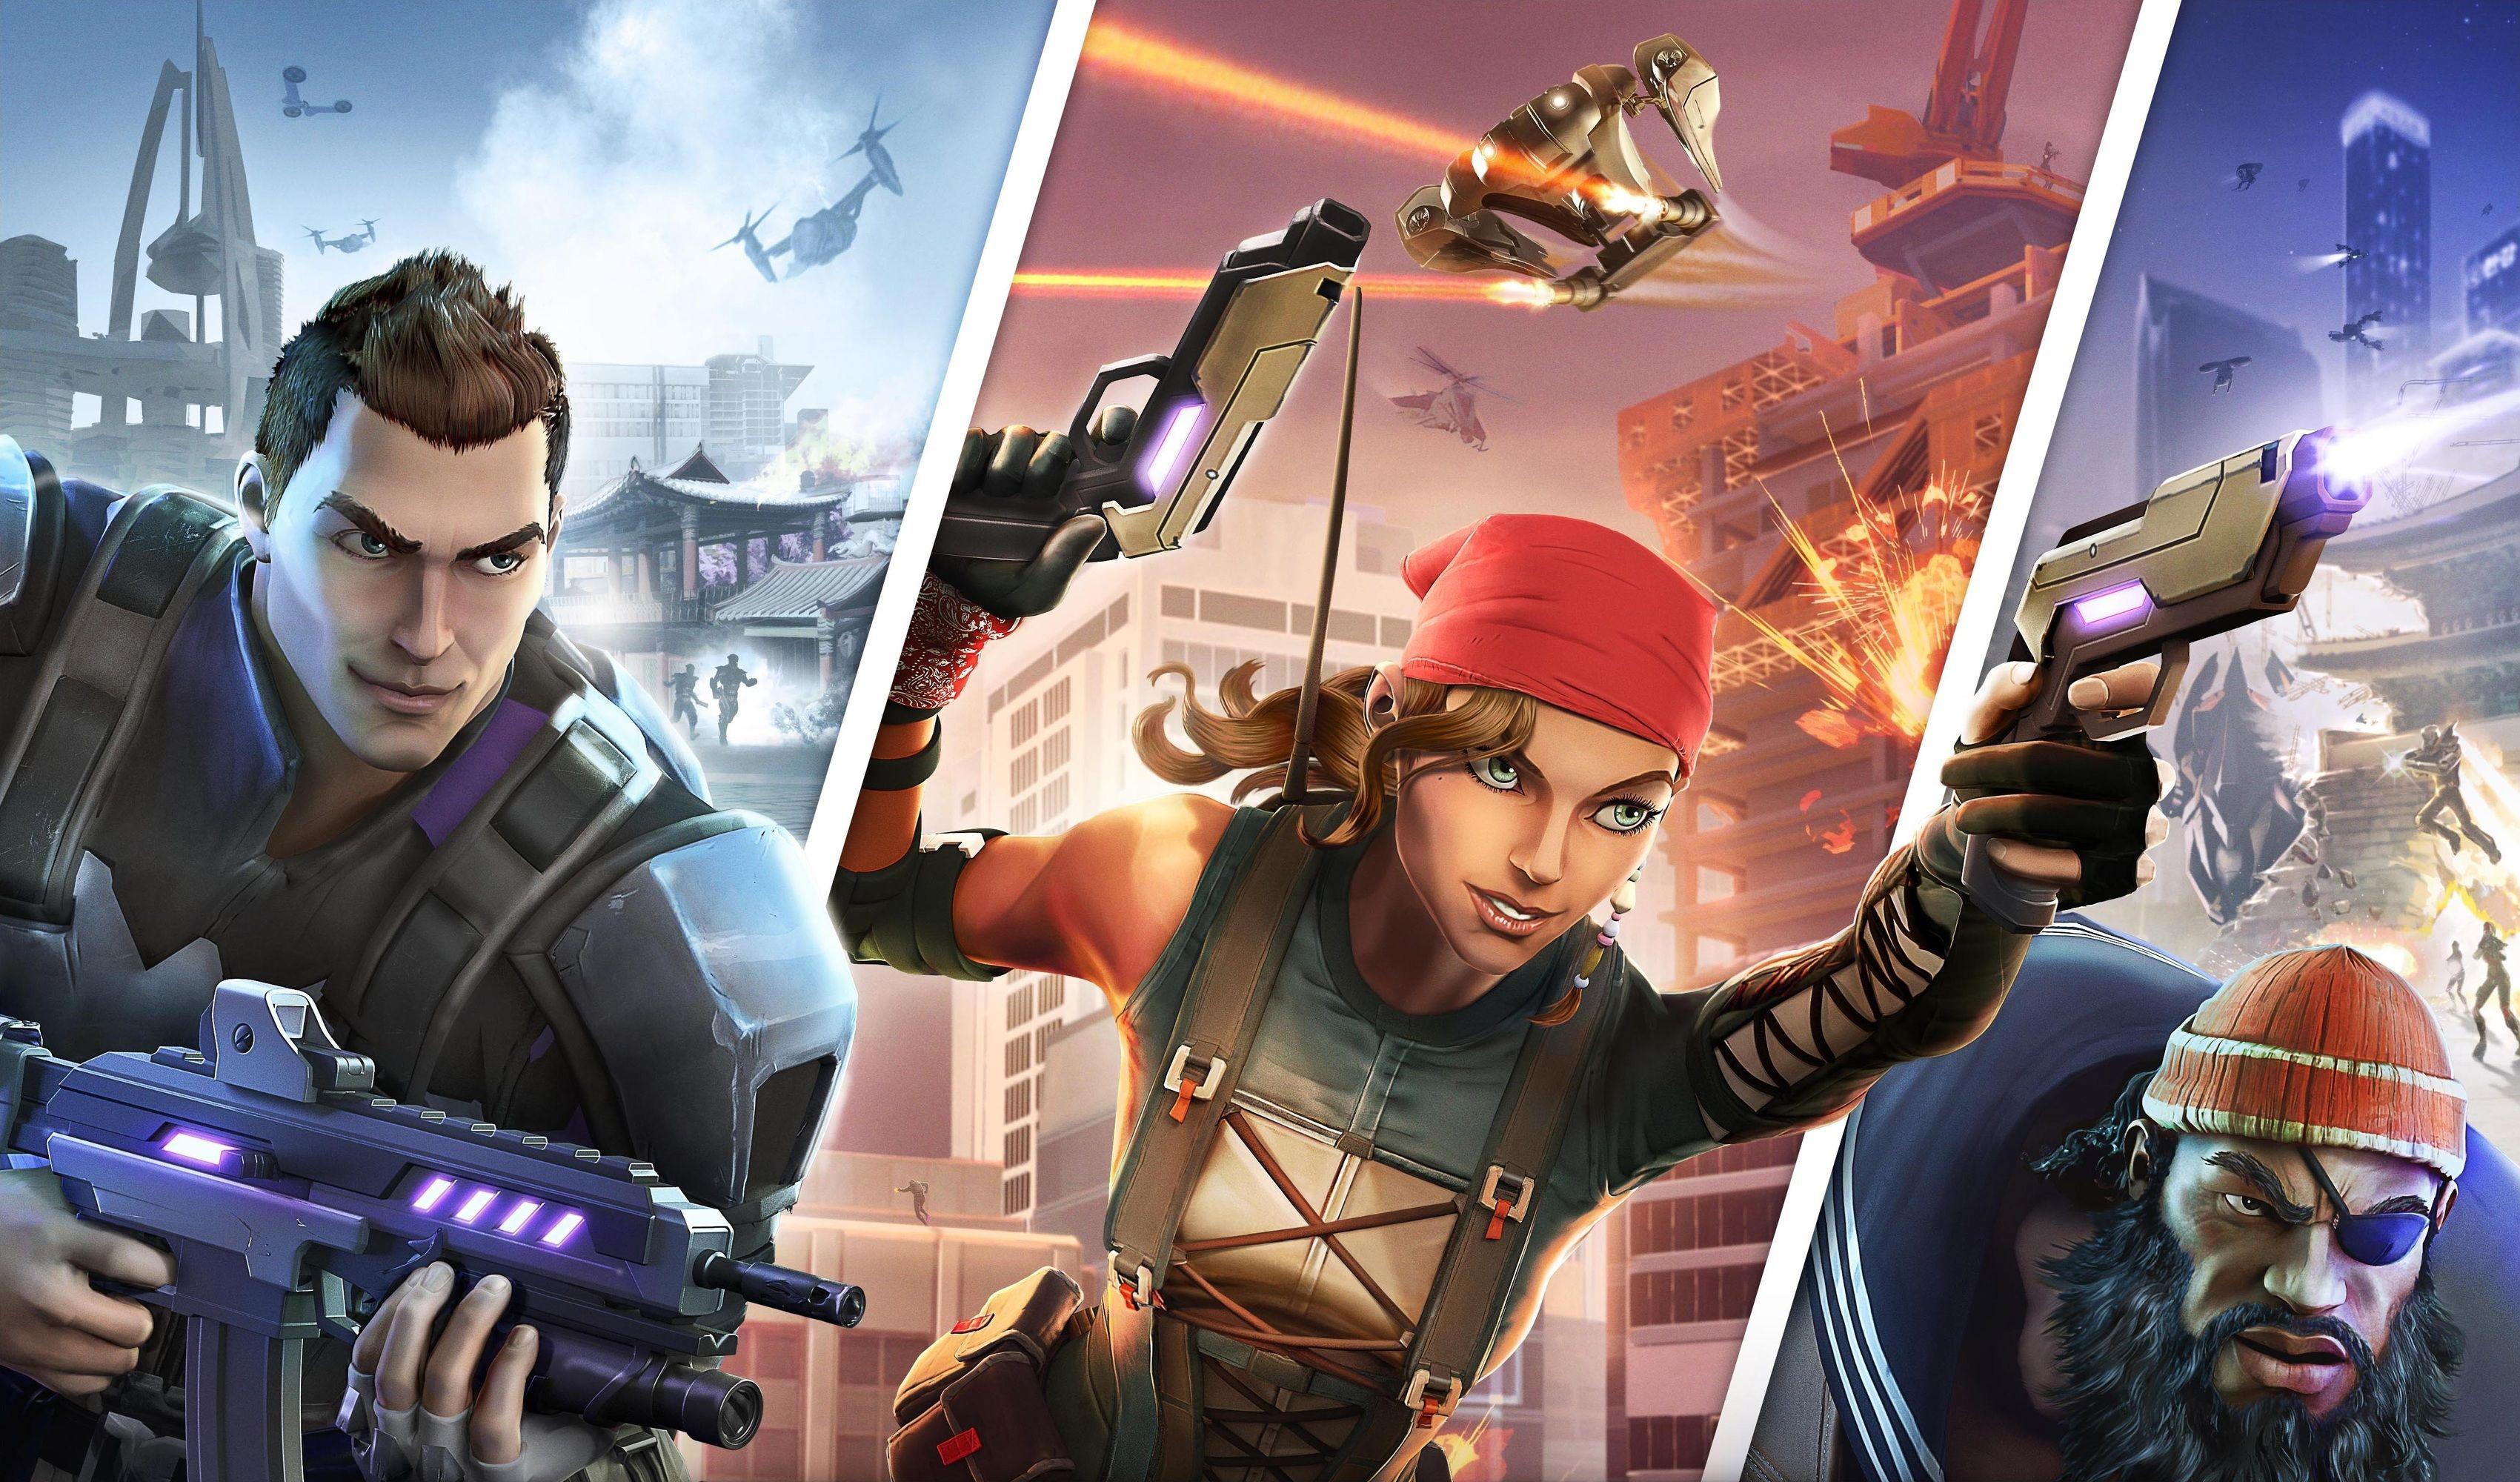 Agents Of Mayhem Artwork Hd Games 4k Wallpapers Images: Agents Of Mayhem Wallpaper, HD Games 4K Wallpapers, Images